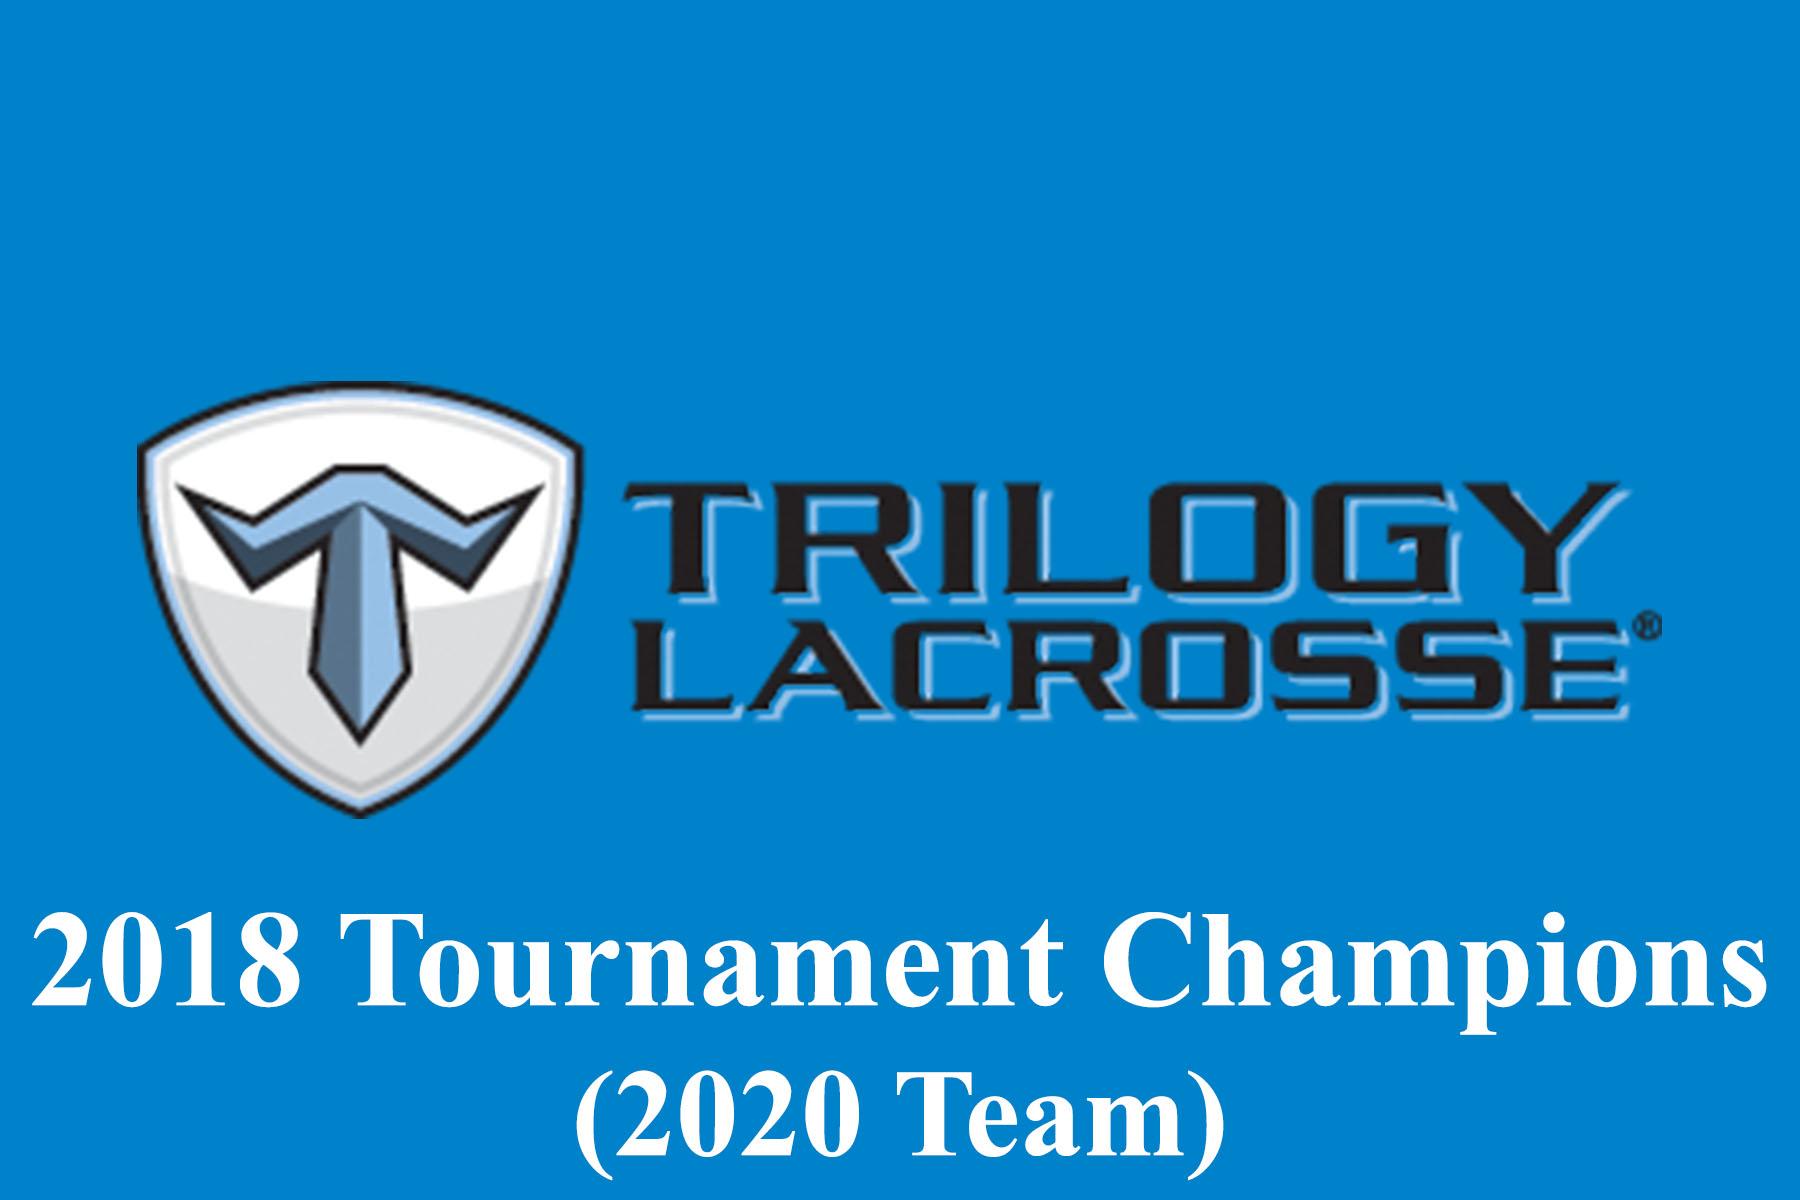 trilogy 24 champs